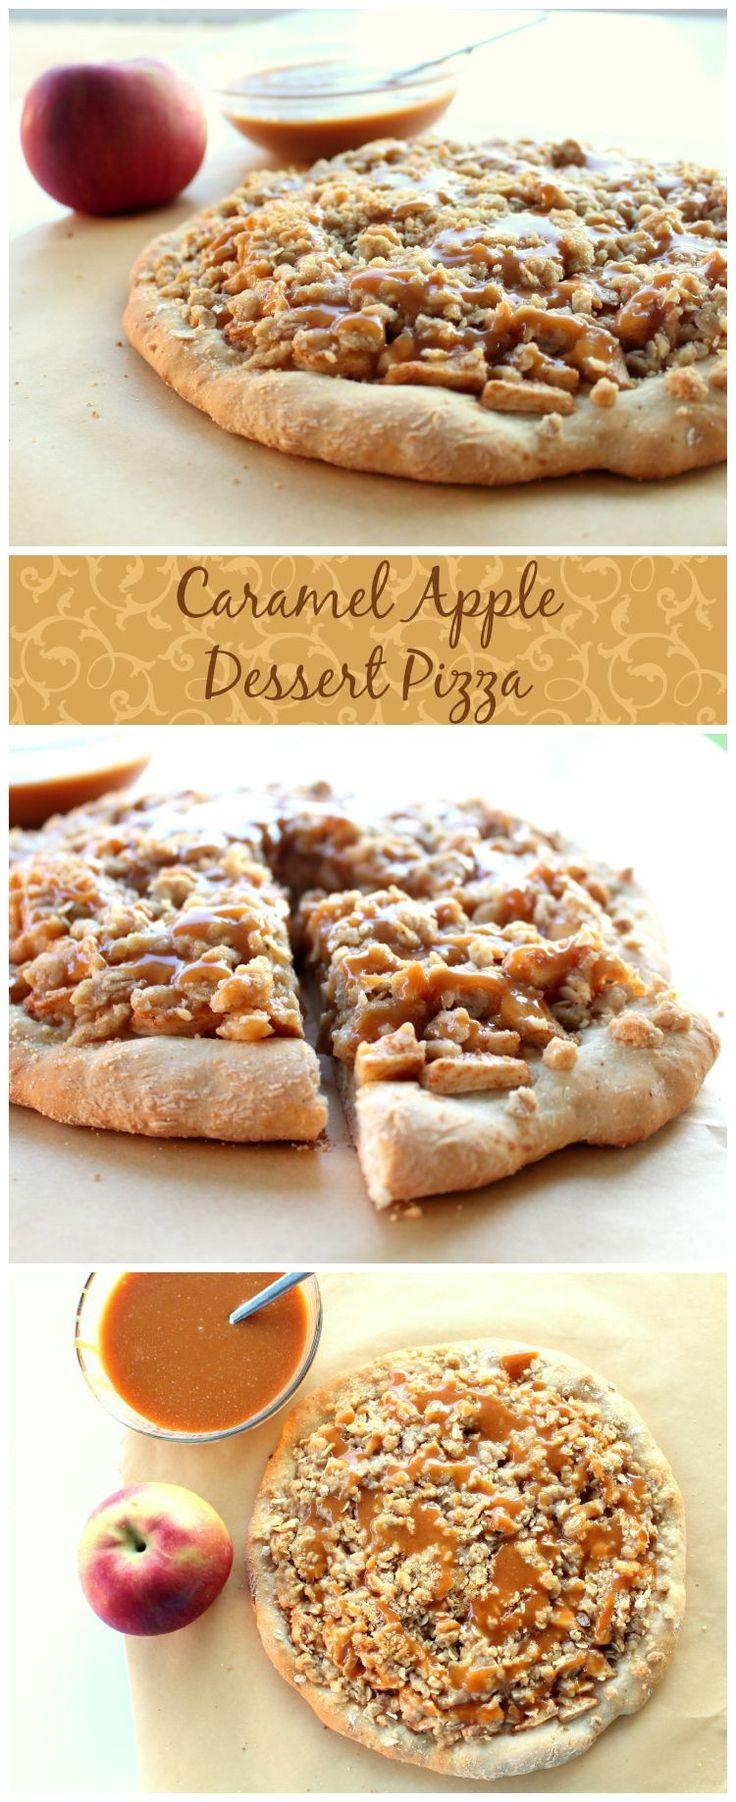 Caramel Apple Dessert Pizza | Recipe | Apple Desserts, Dessert Pizza ...